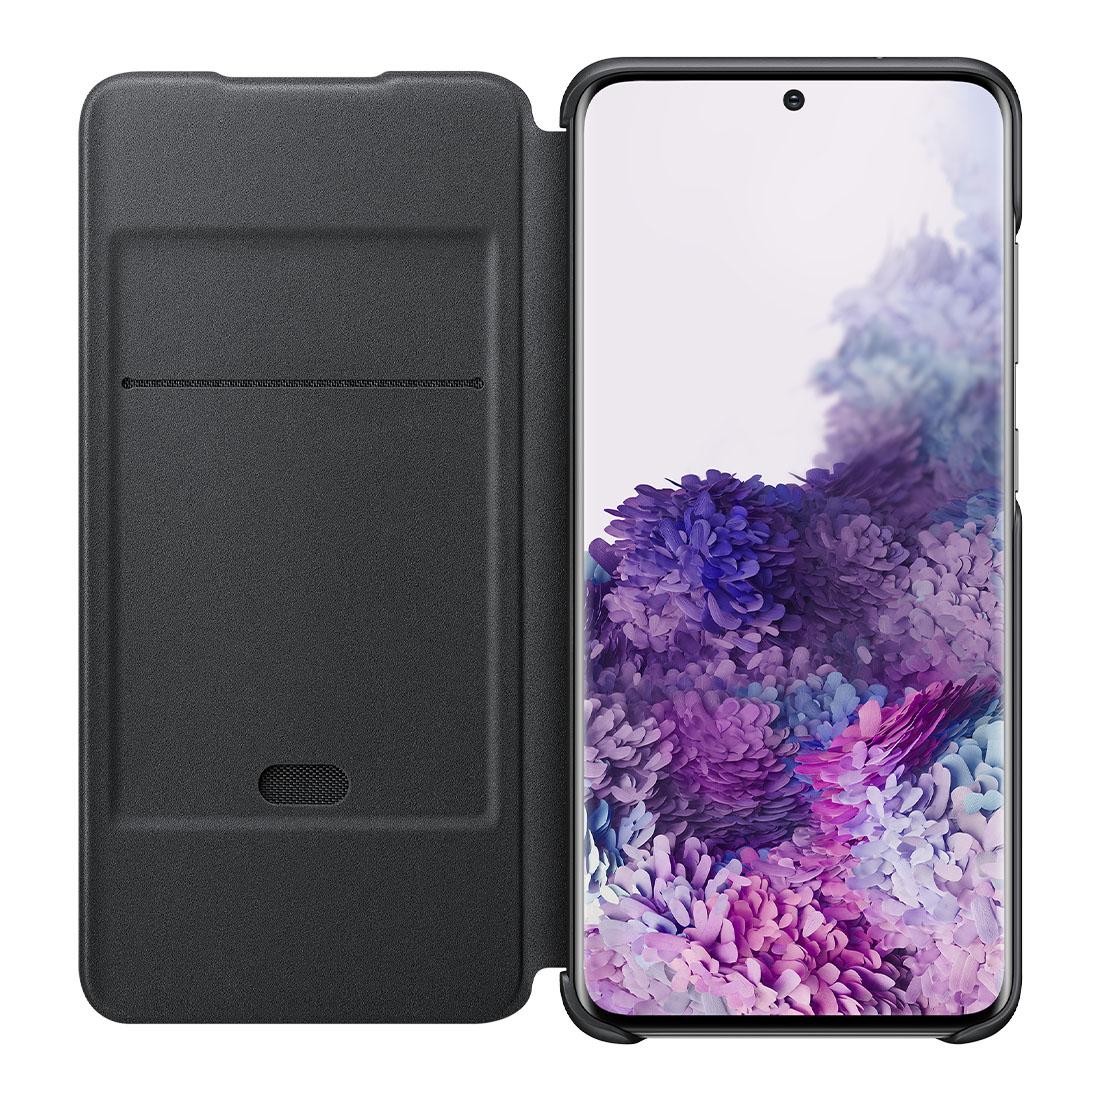 Capa Original Samsung Led Wallet Galaxy S20 6.2 Pol G980